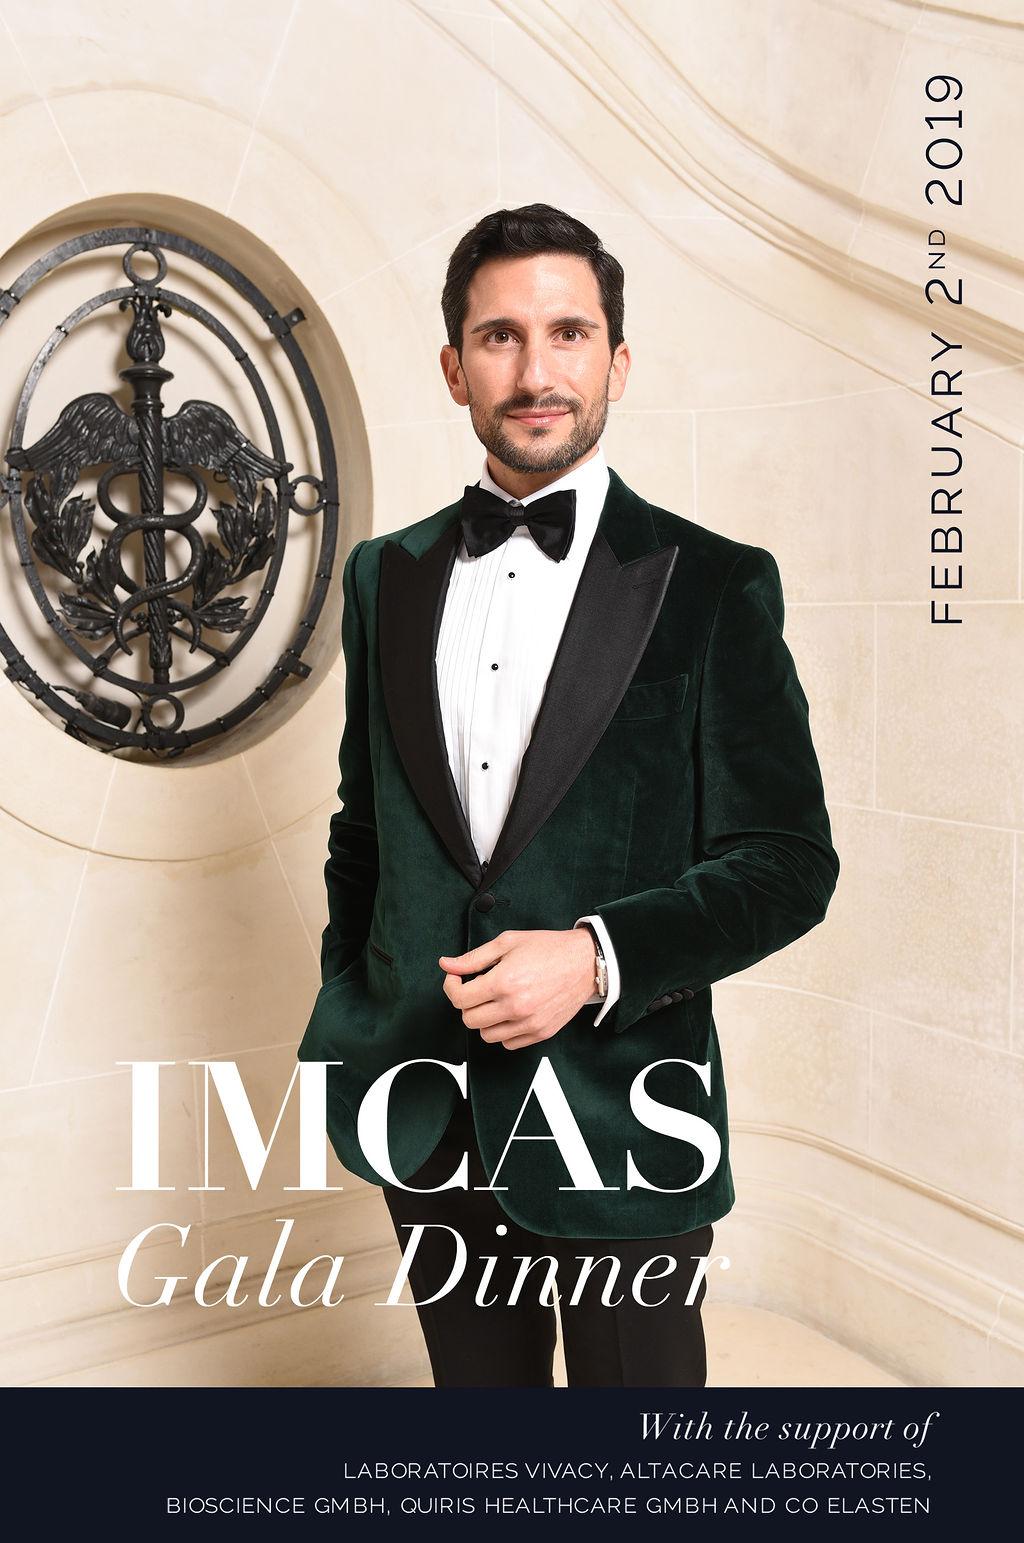 IMCAS-Gala-Dinner_Photocall